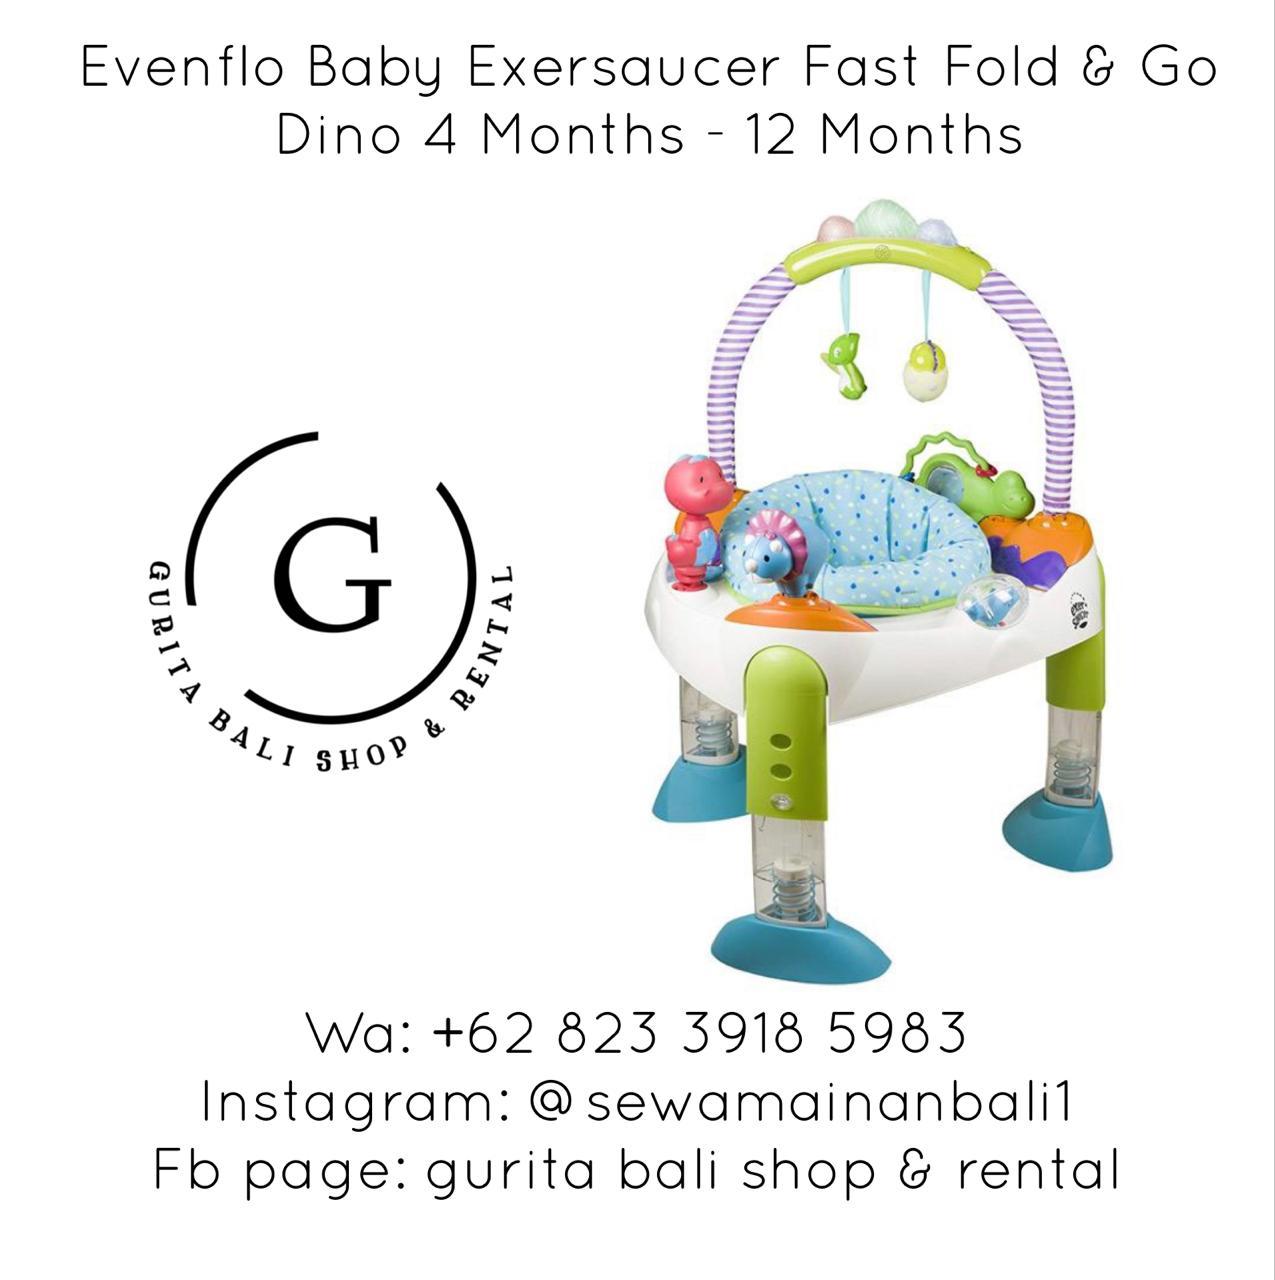 EVENFLO BABY EXERSAUCER FAST FOLD & GO